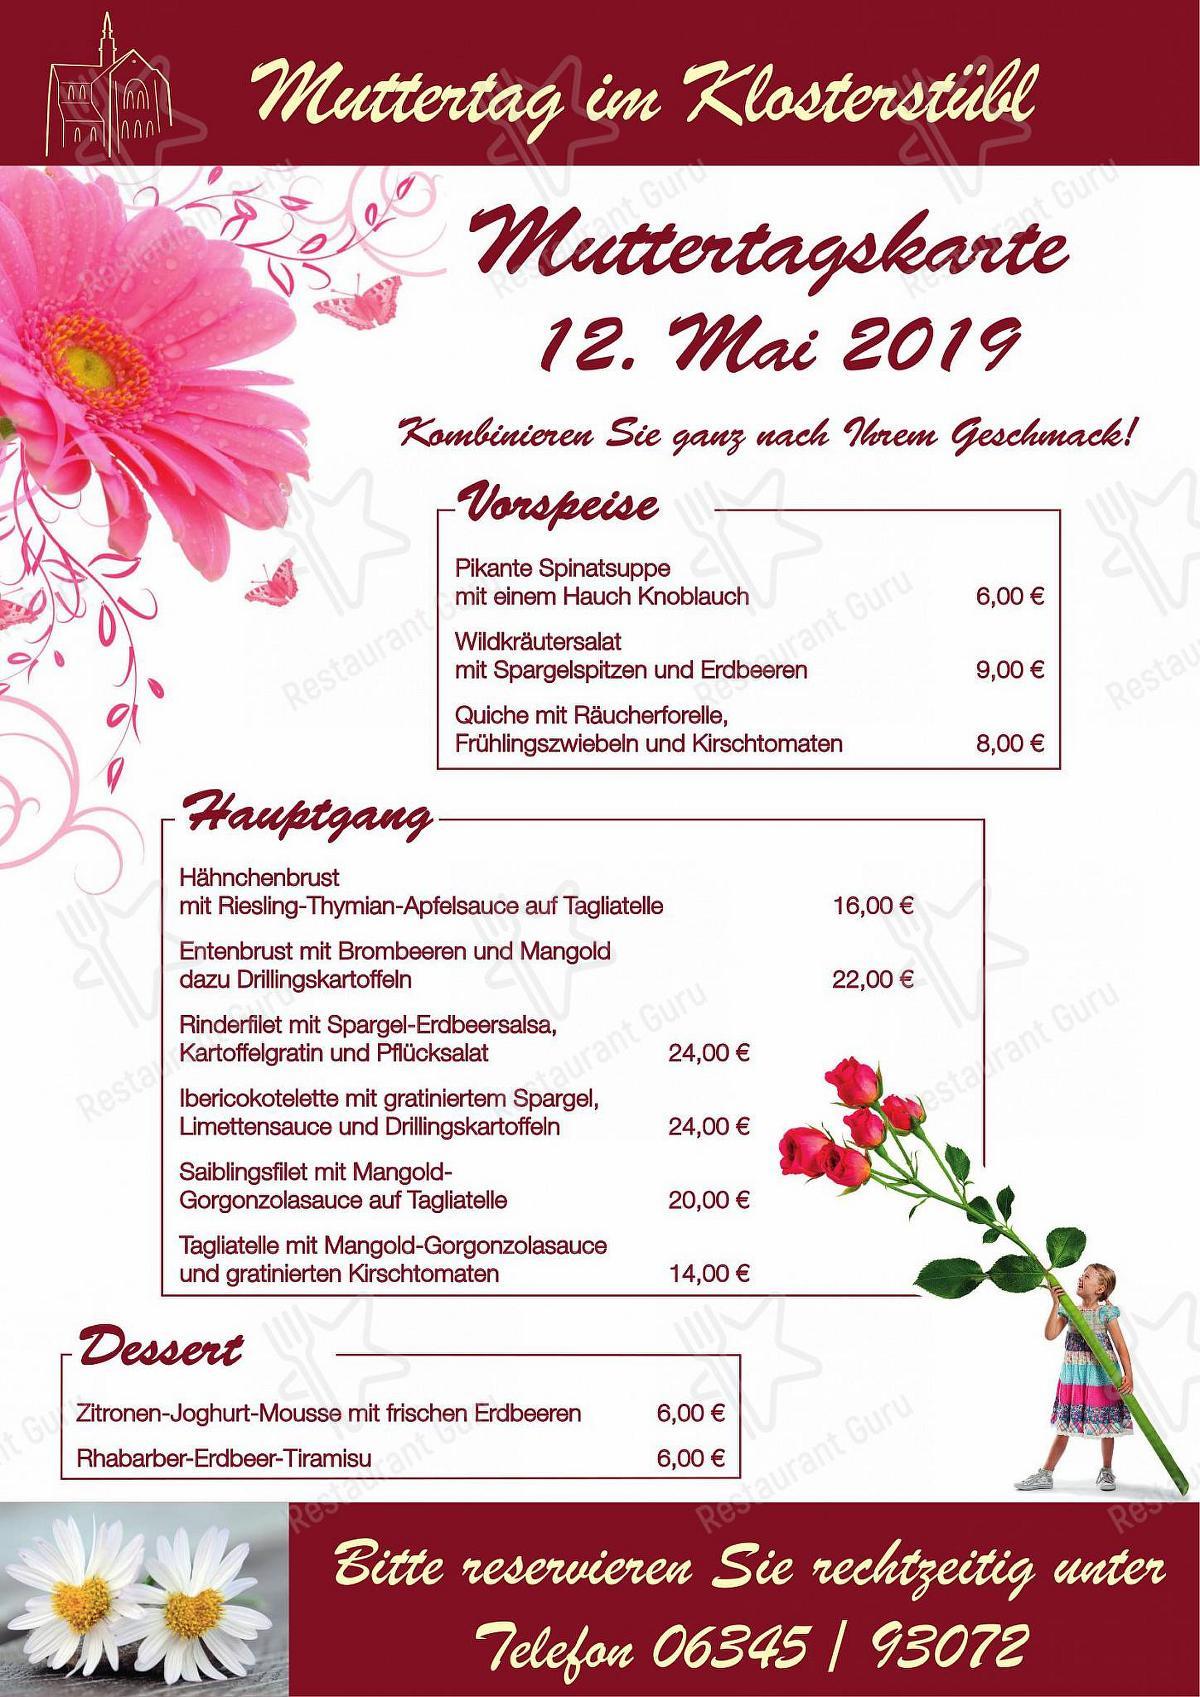 Меню Klosterstüb'l - блюда и напитки